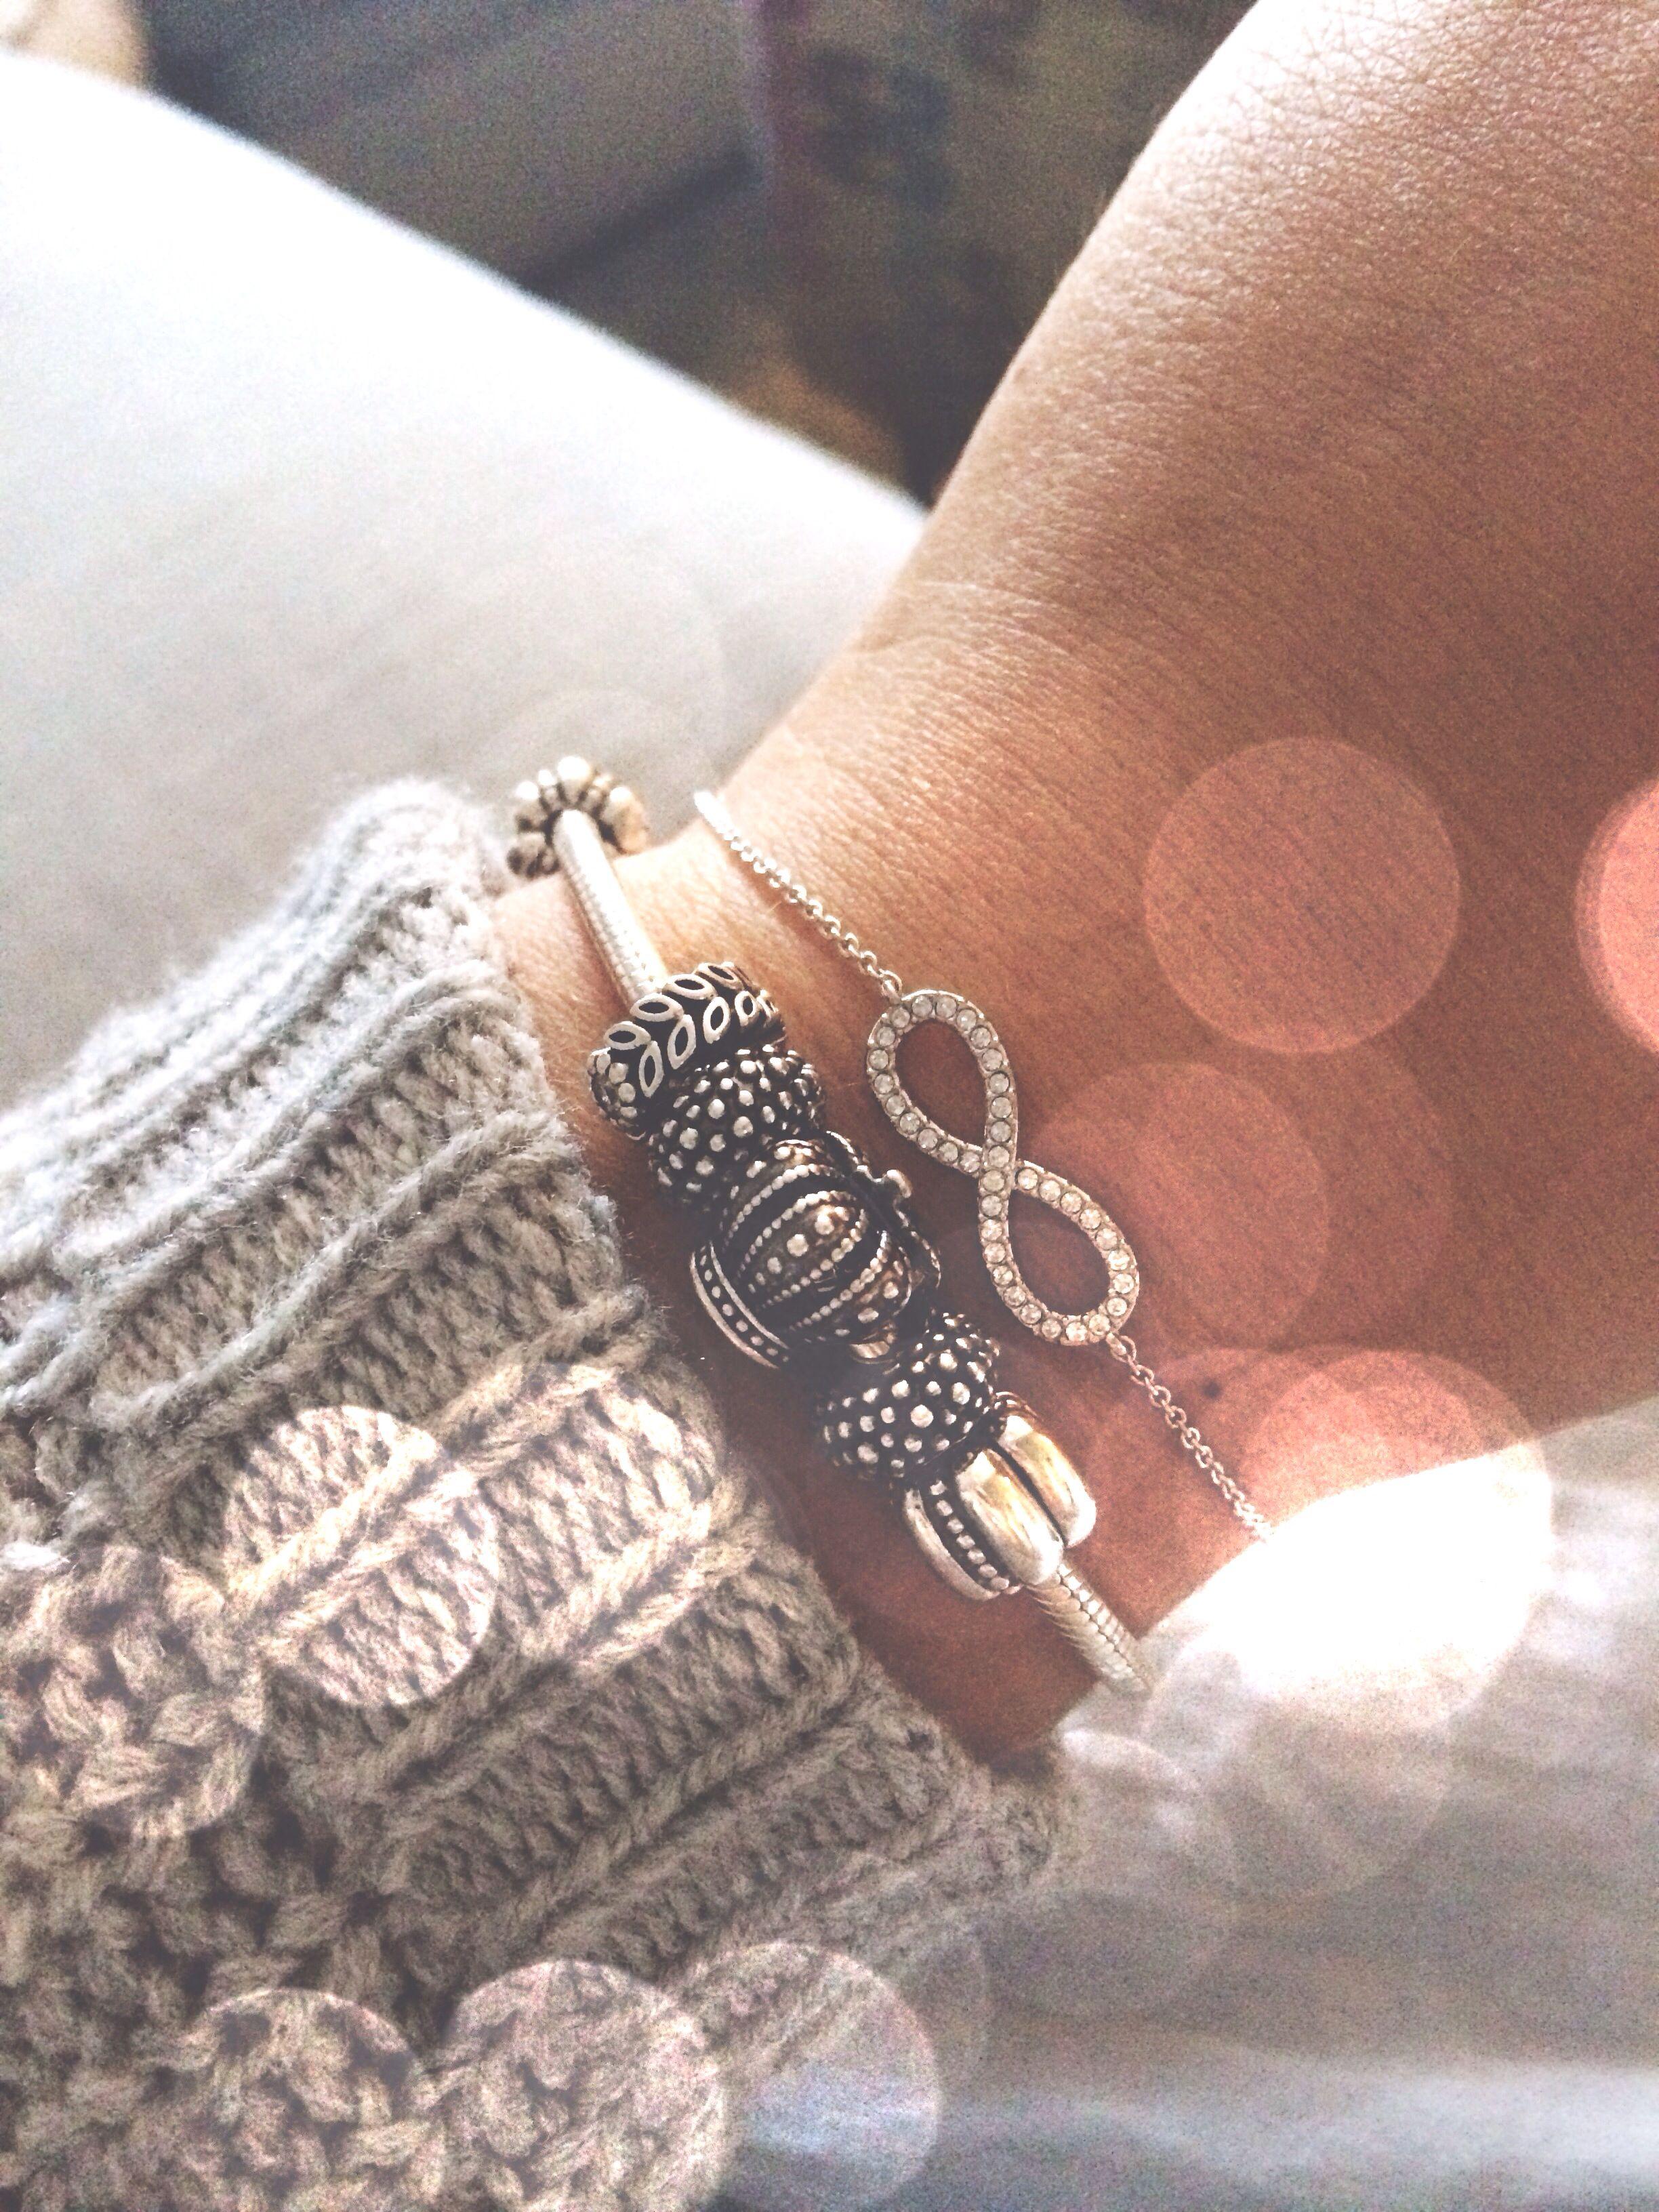 bef64f282 Pandora and Infinity Bracelet | Style in 2019 | Bracelets, Sapphire ...